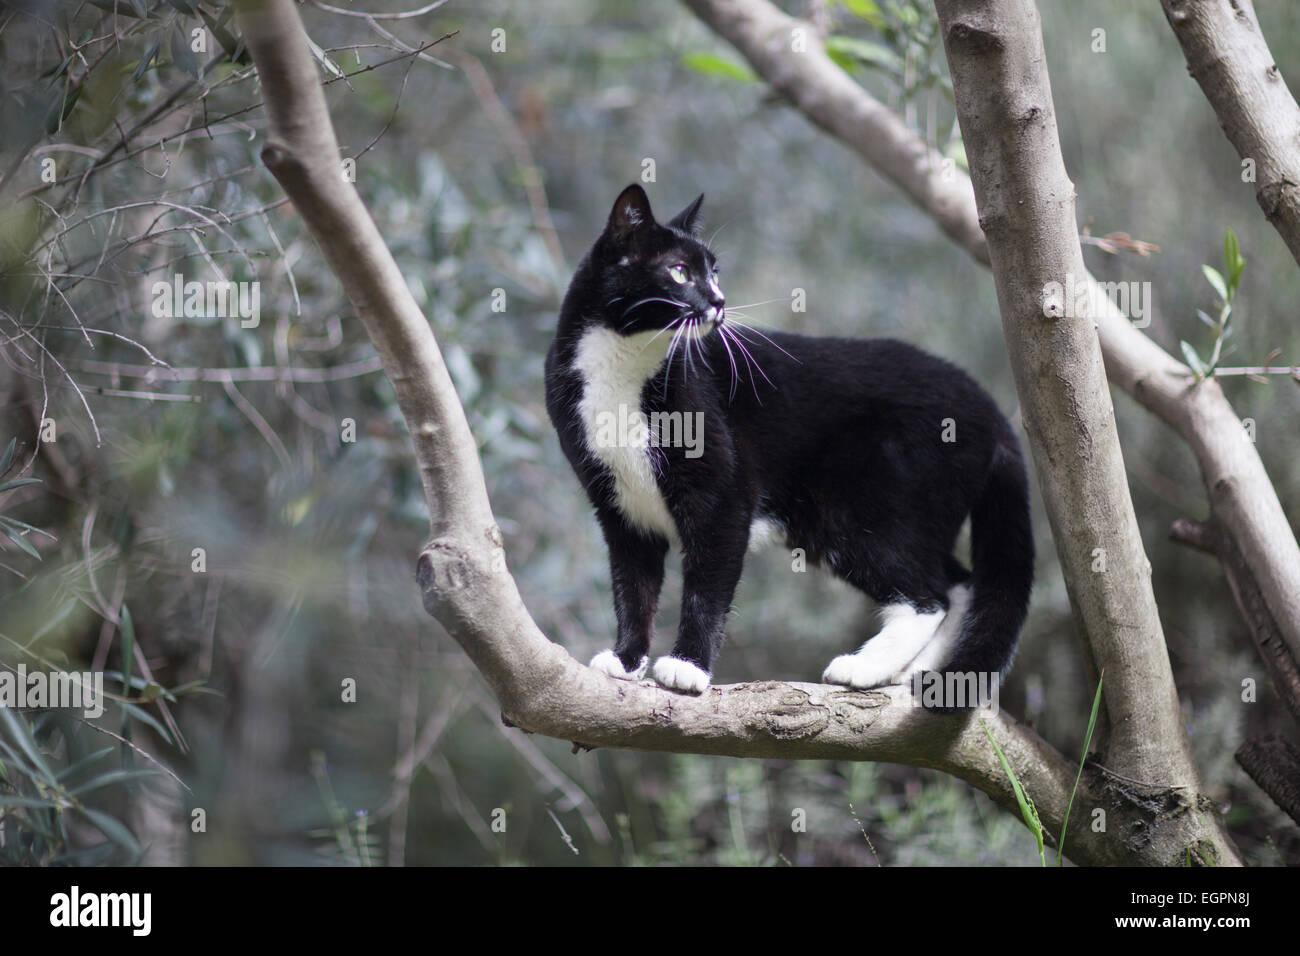 tuxedo pet cat explores yard - Stock Image